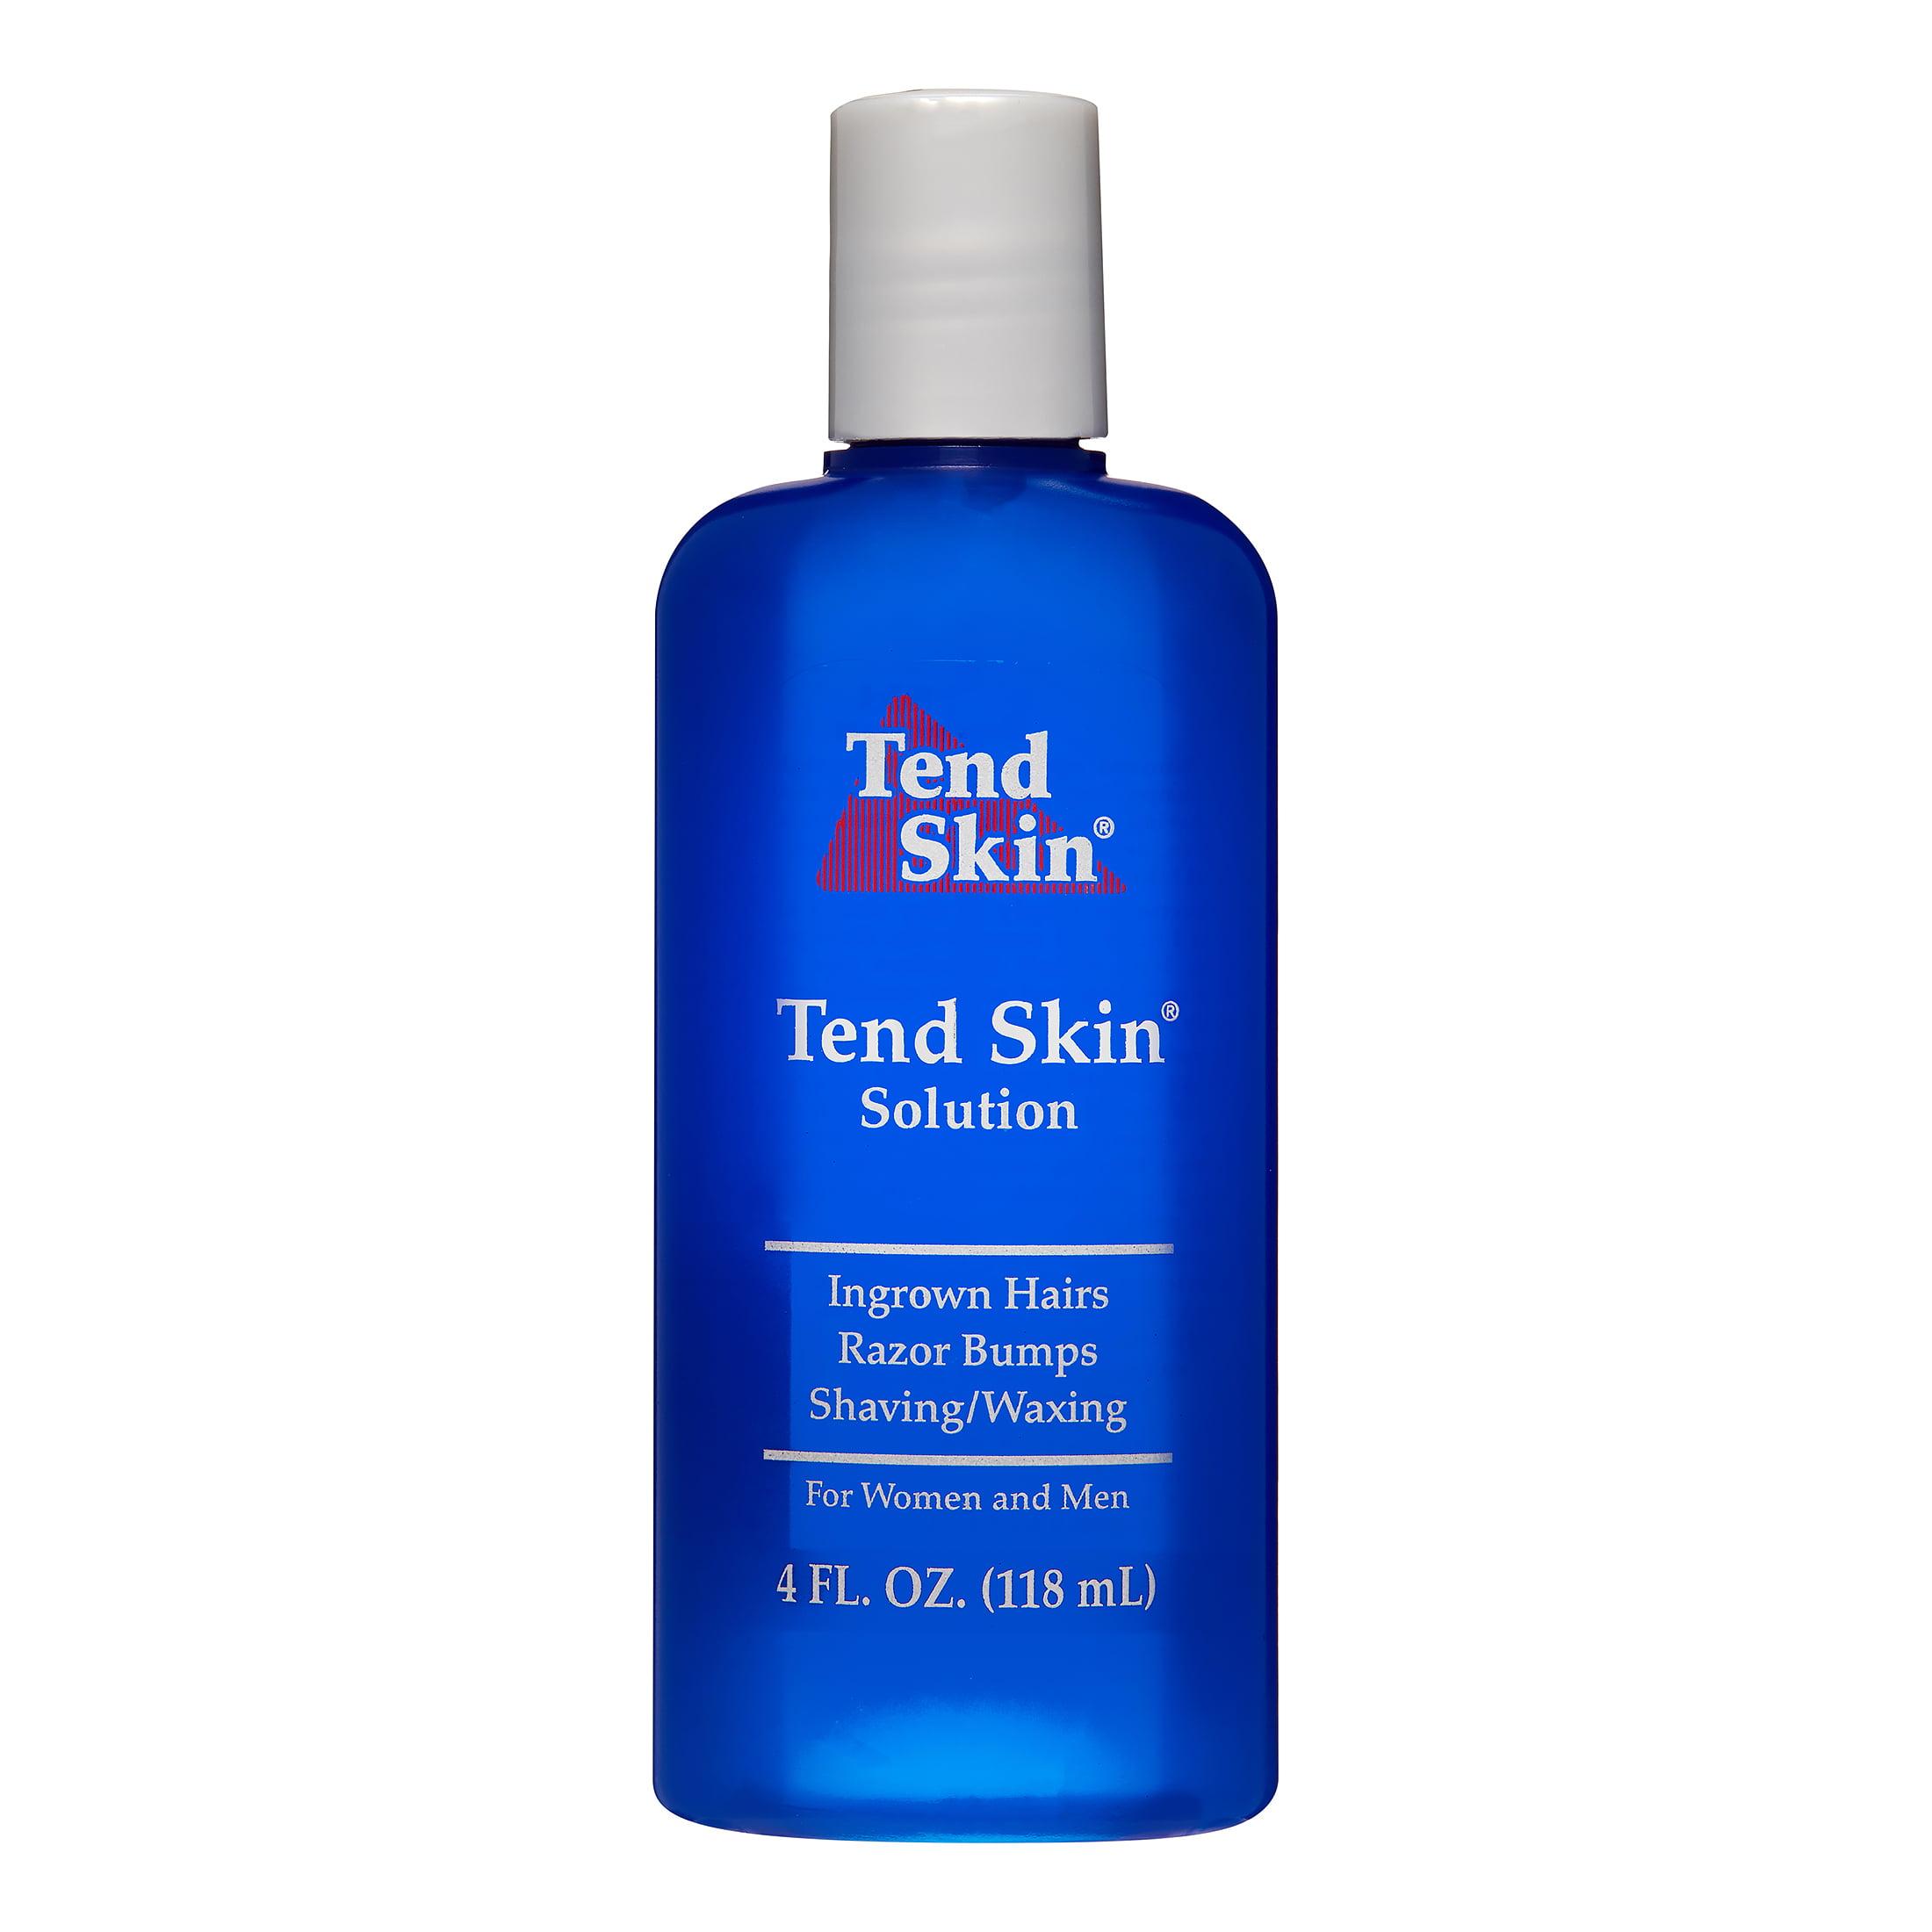 220295e740 Tend Skin - Tend Skin Razor Bump Solution